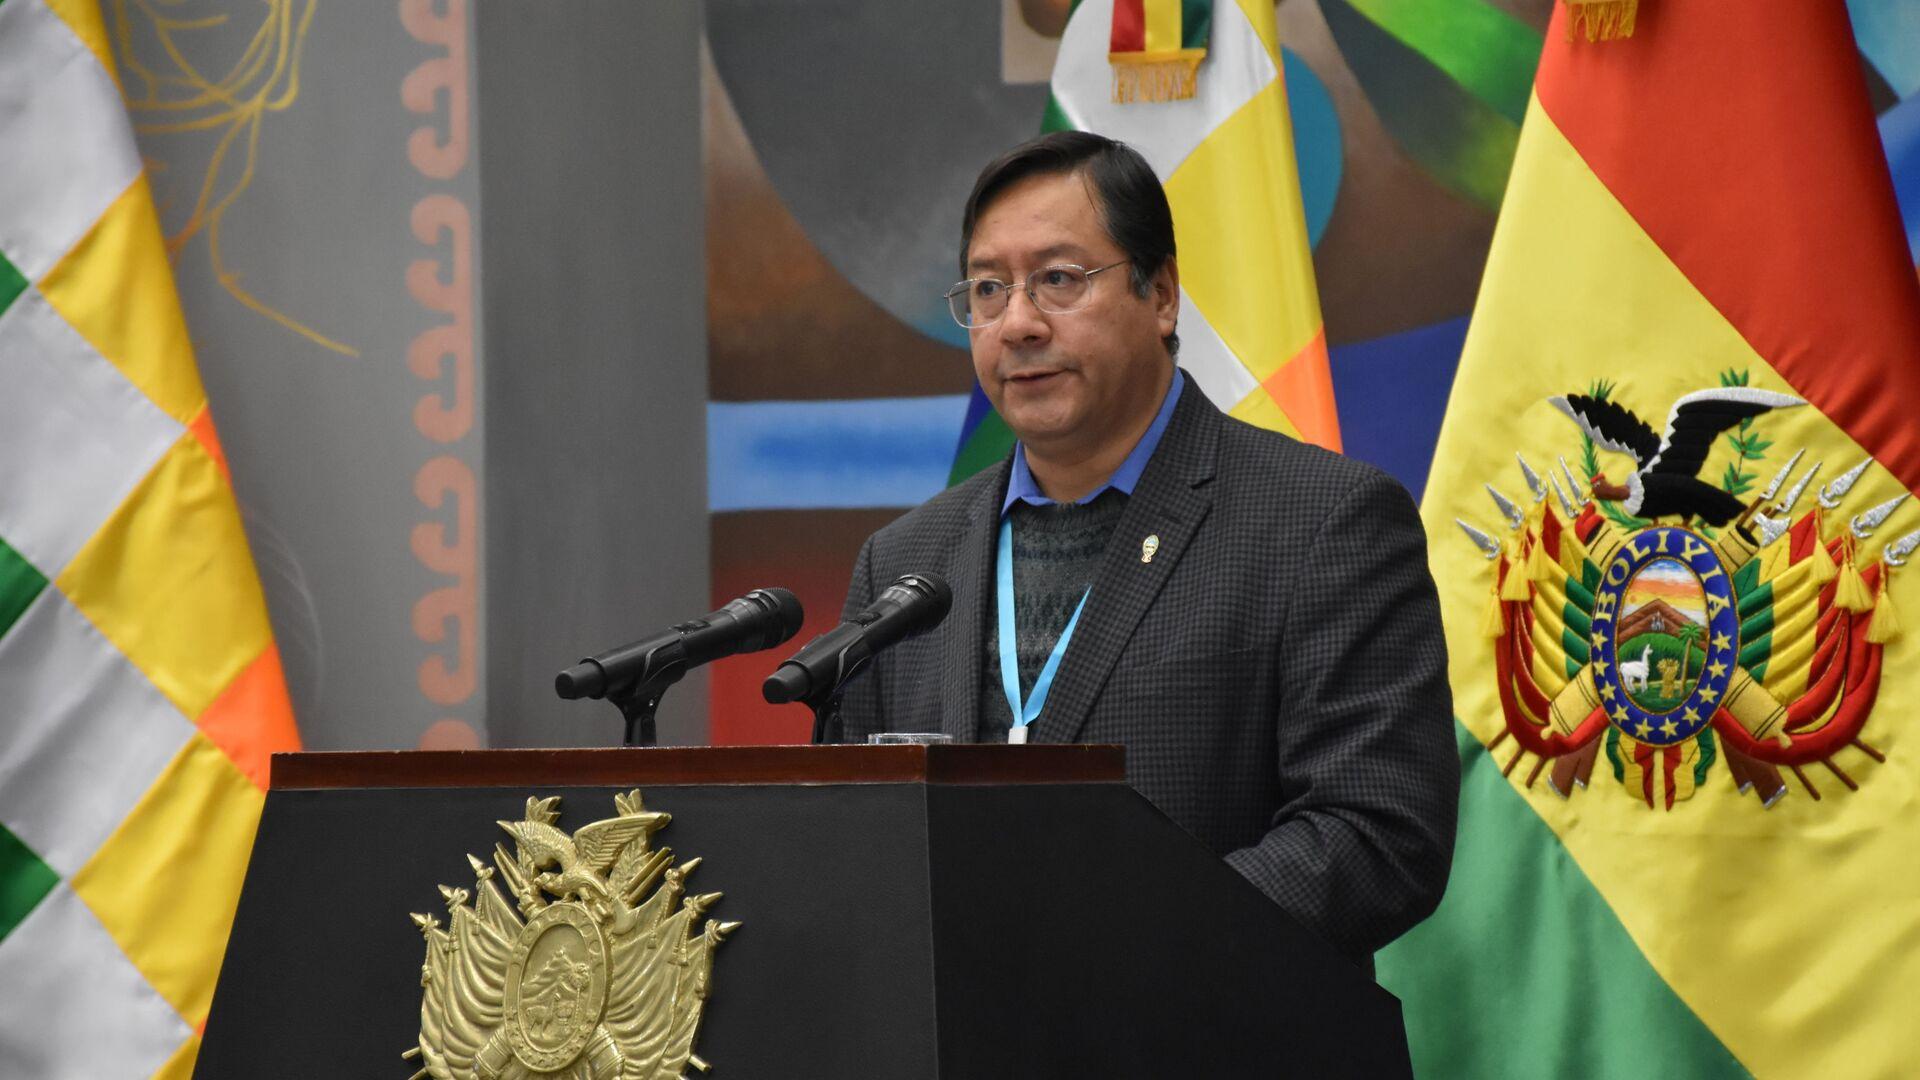 Luis Arce, el presidente de Bolivia - Sputnik Mundo, 1920, 17.02.2021